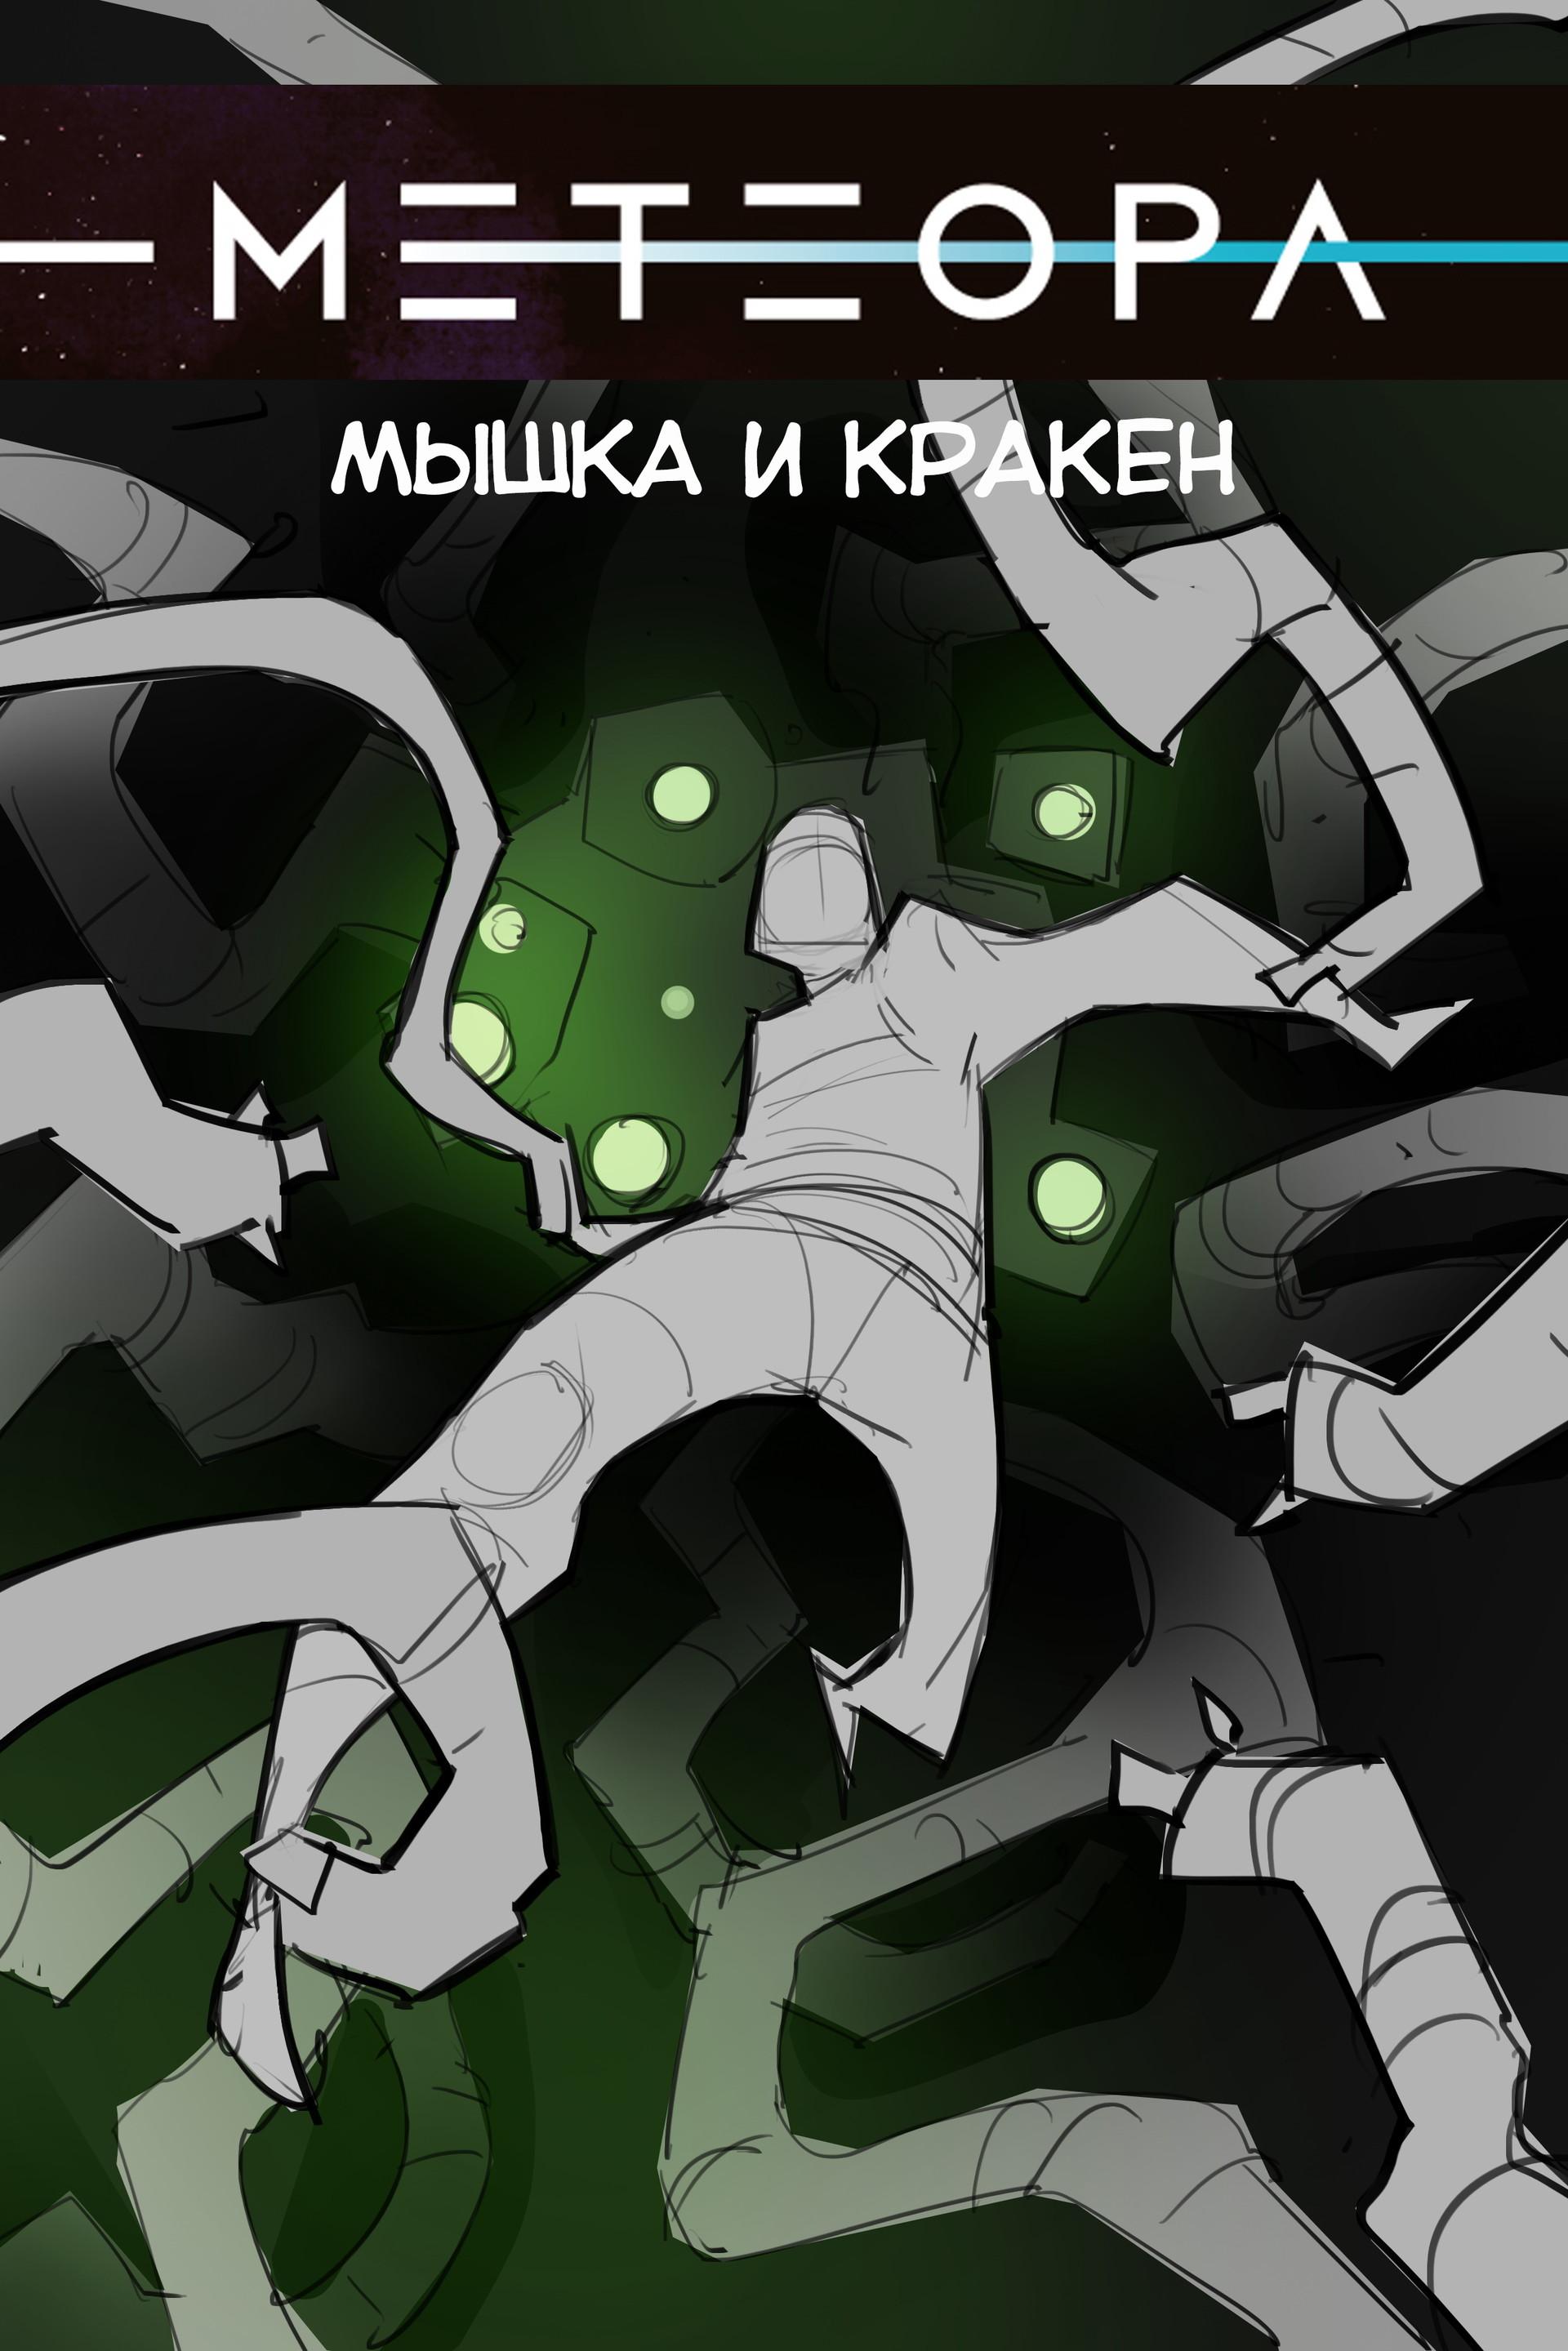 Eduard petrovich 0